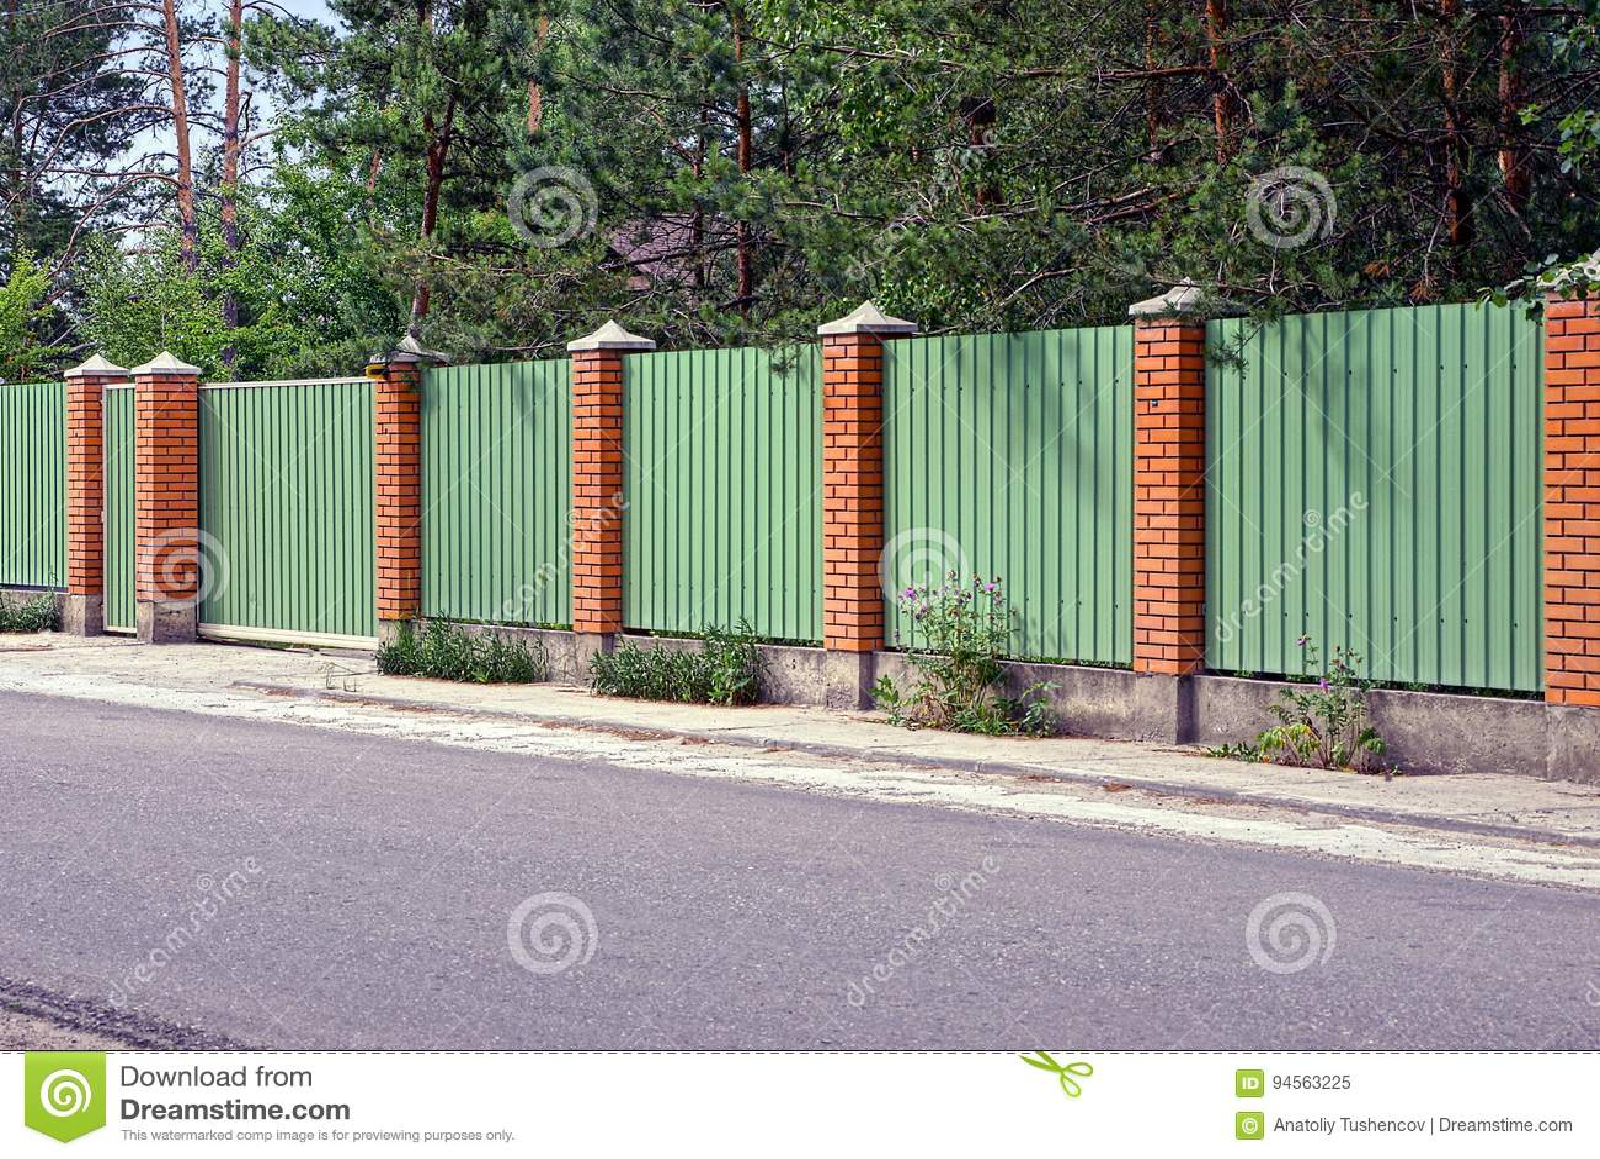 Grüner Zaun Und Tore Vor Der Asphaltstraße Stockbild Bild